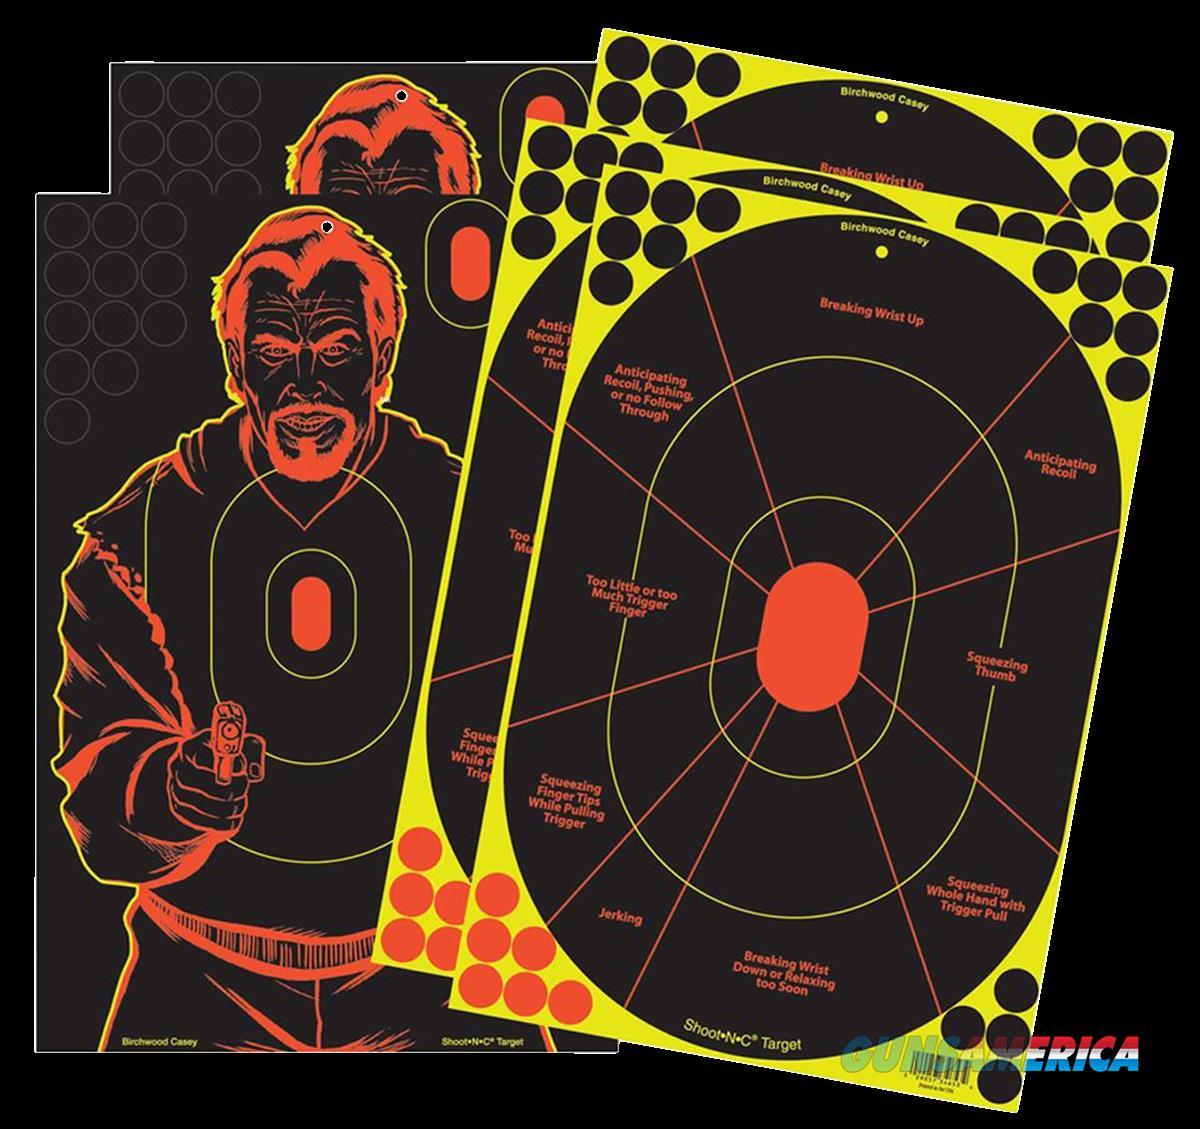 Birchwood Casey Shoot-n-c, Bir 34630 Shoot-n-c 12x18 3trainer-2badguy Targets  Guns > Pistols > 1911 Pistol Copies (non-Colt)